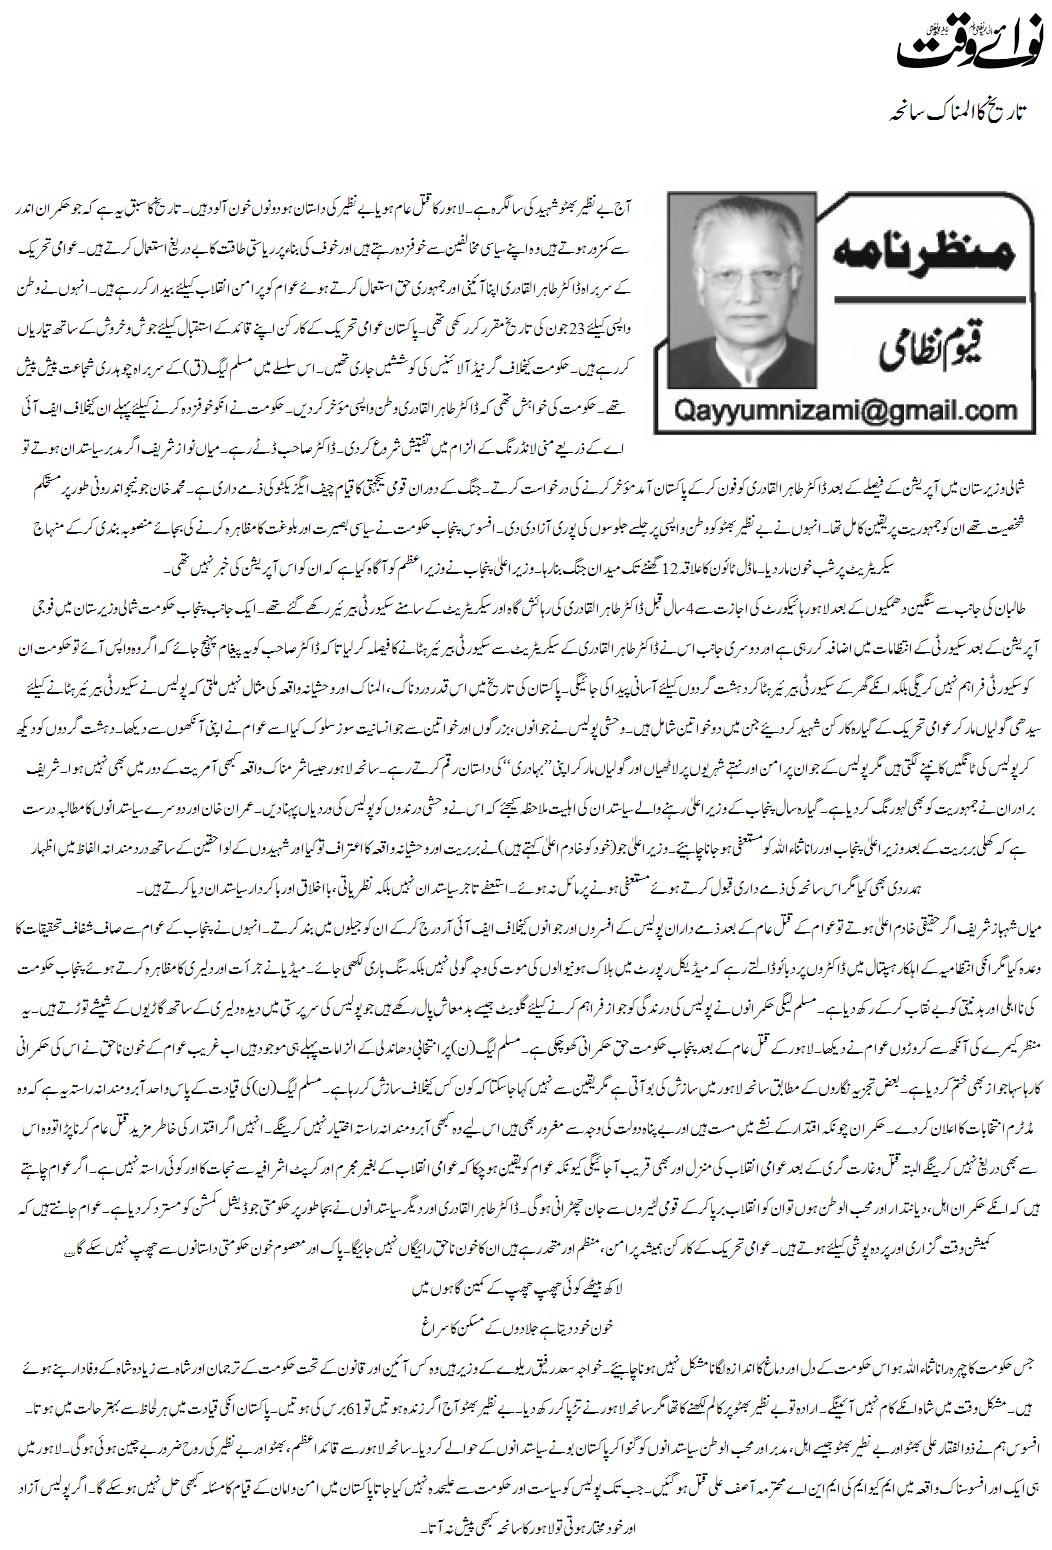 Print Media Coverage Nawa-i-Waqt - Qayyum-Nizami